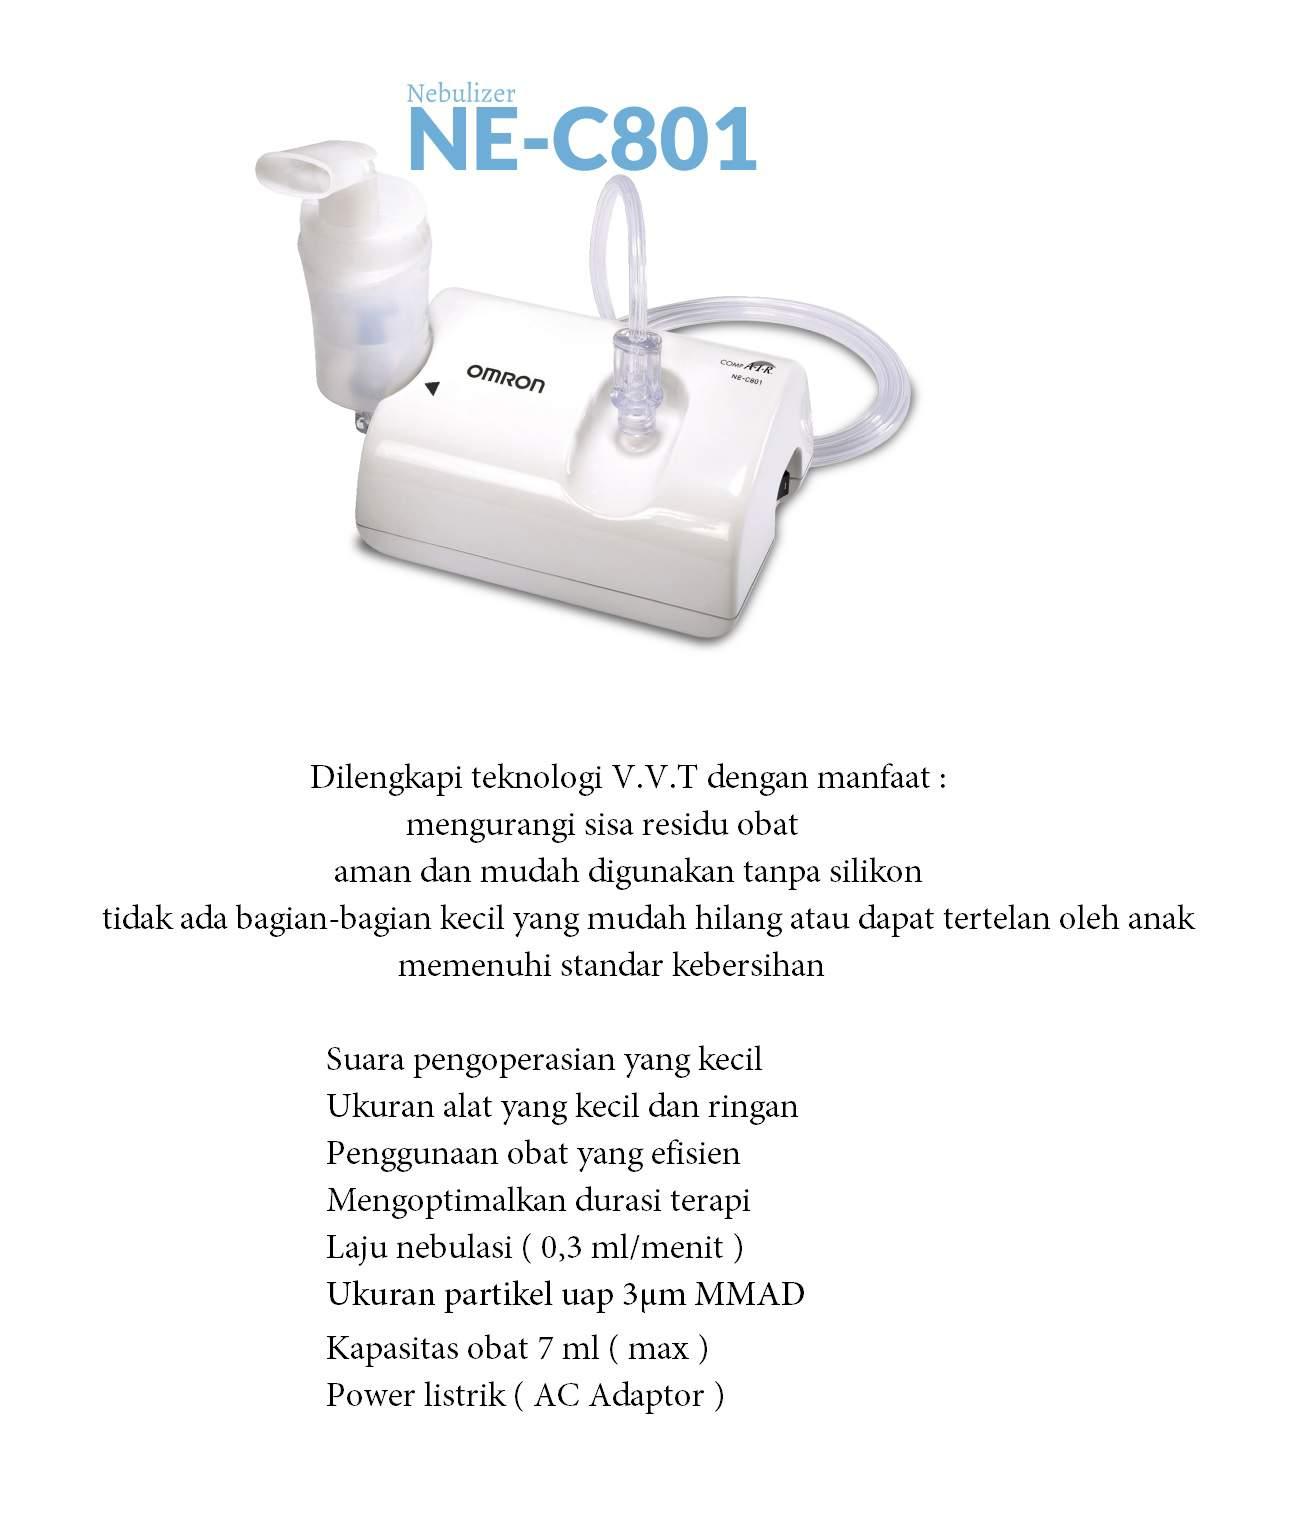 OMRON Nebulizer NE-C801